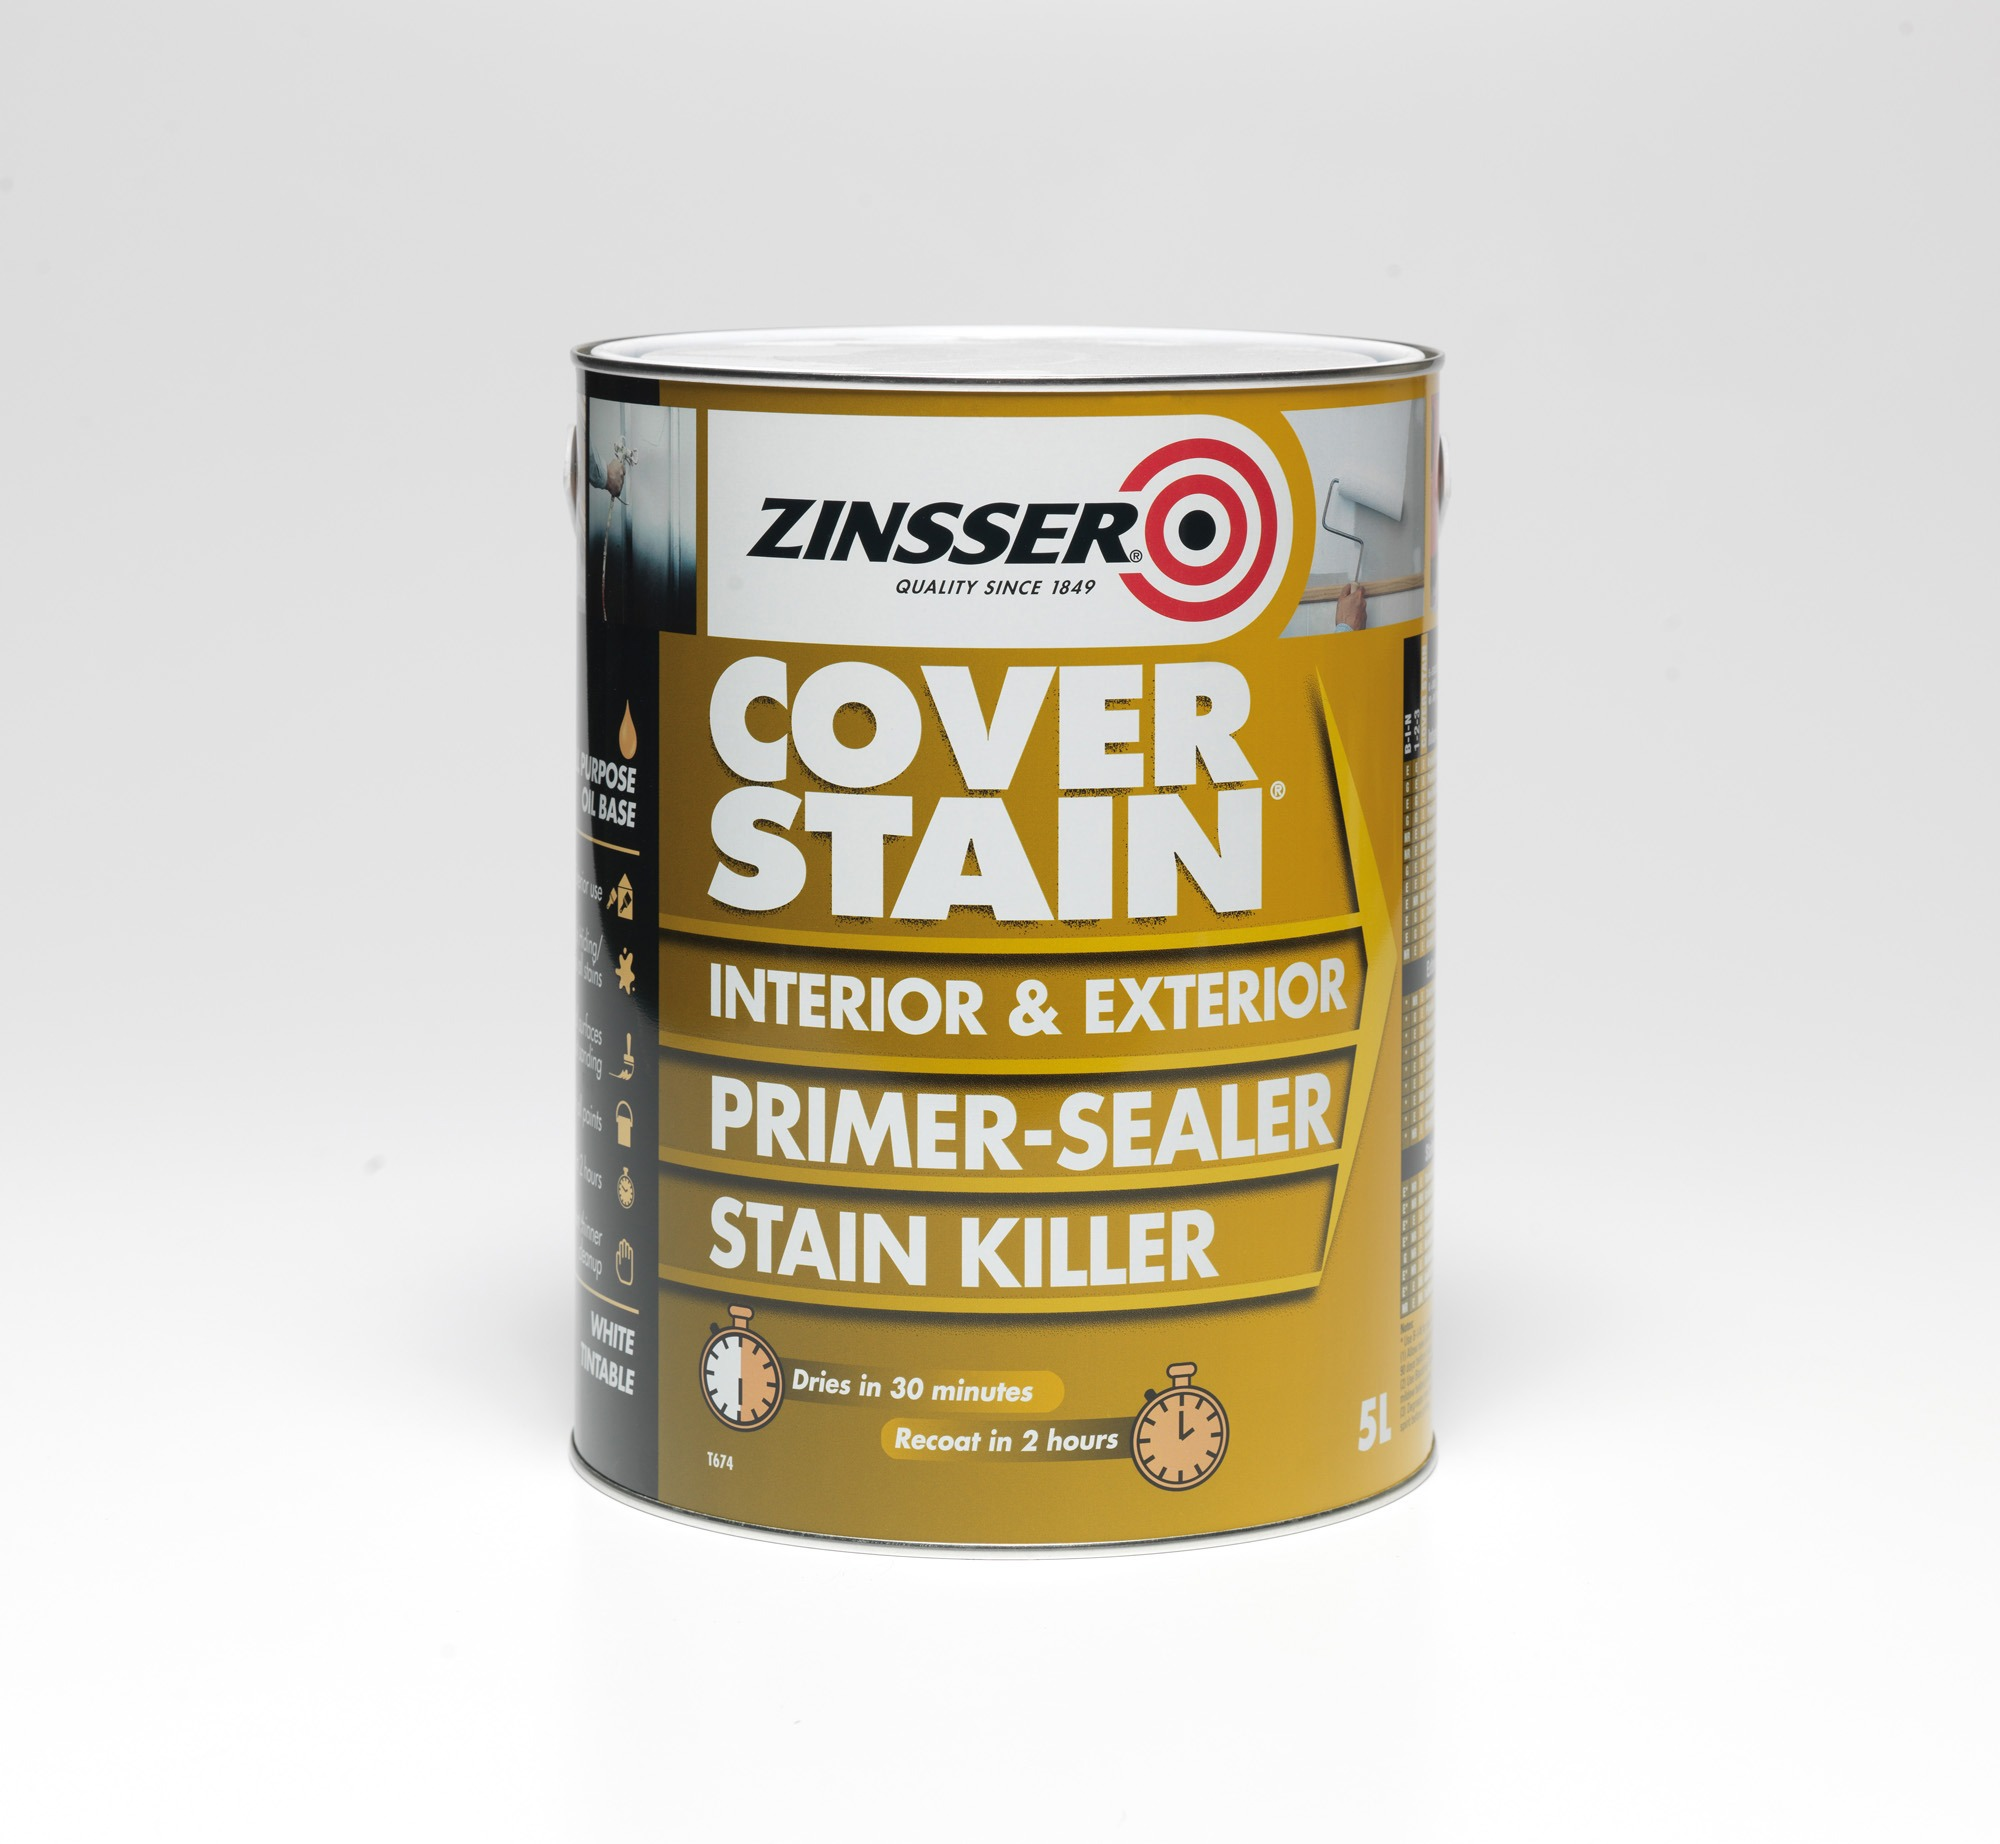 Zinsser Coverstain Primer Andrews Coatings Limited